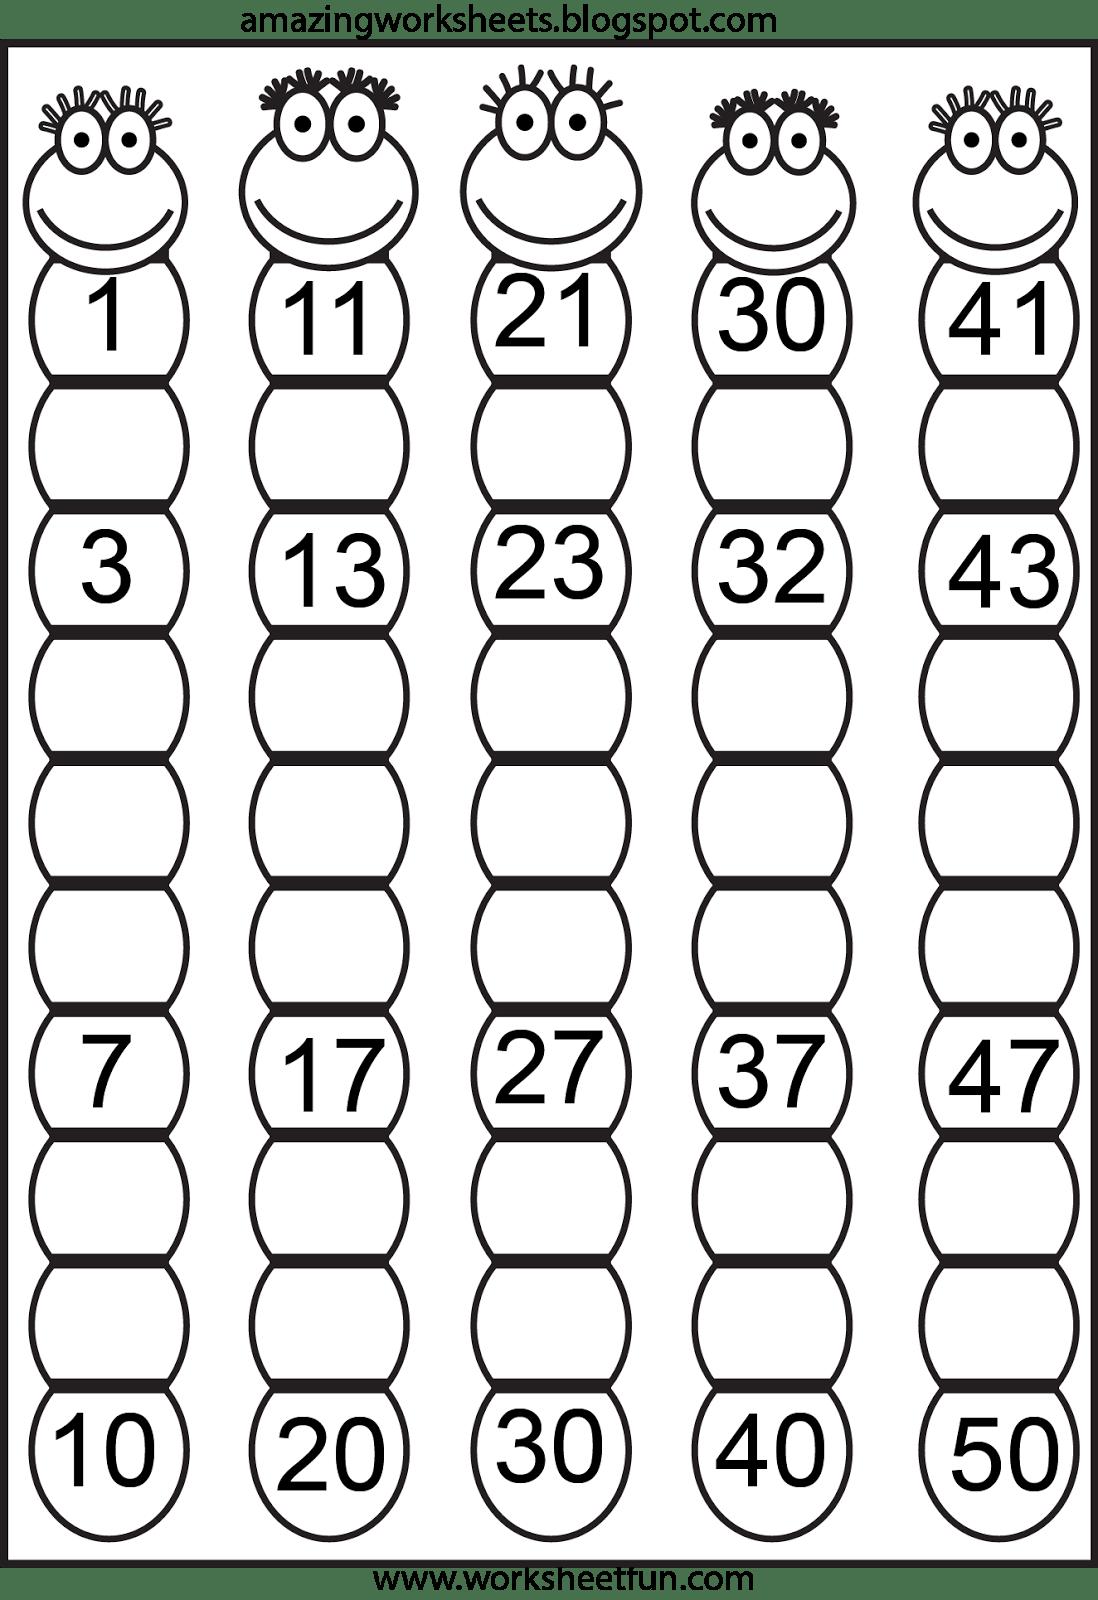 Worksheet For Kg In Hindi